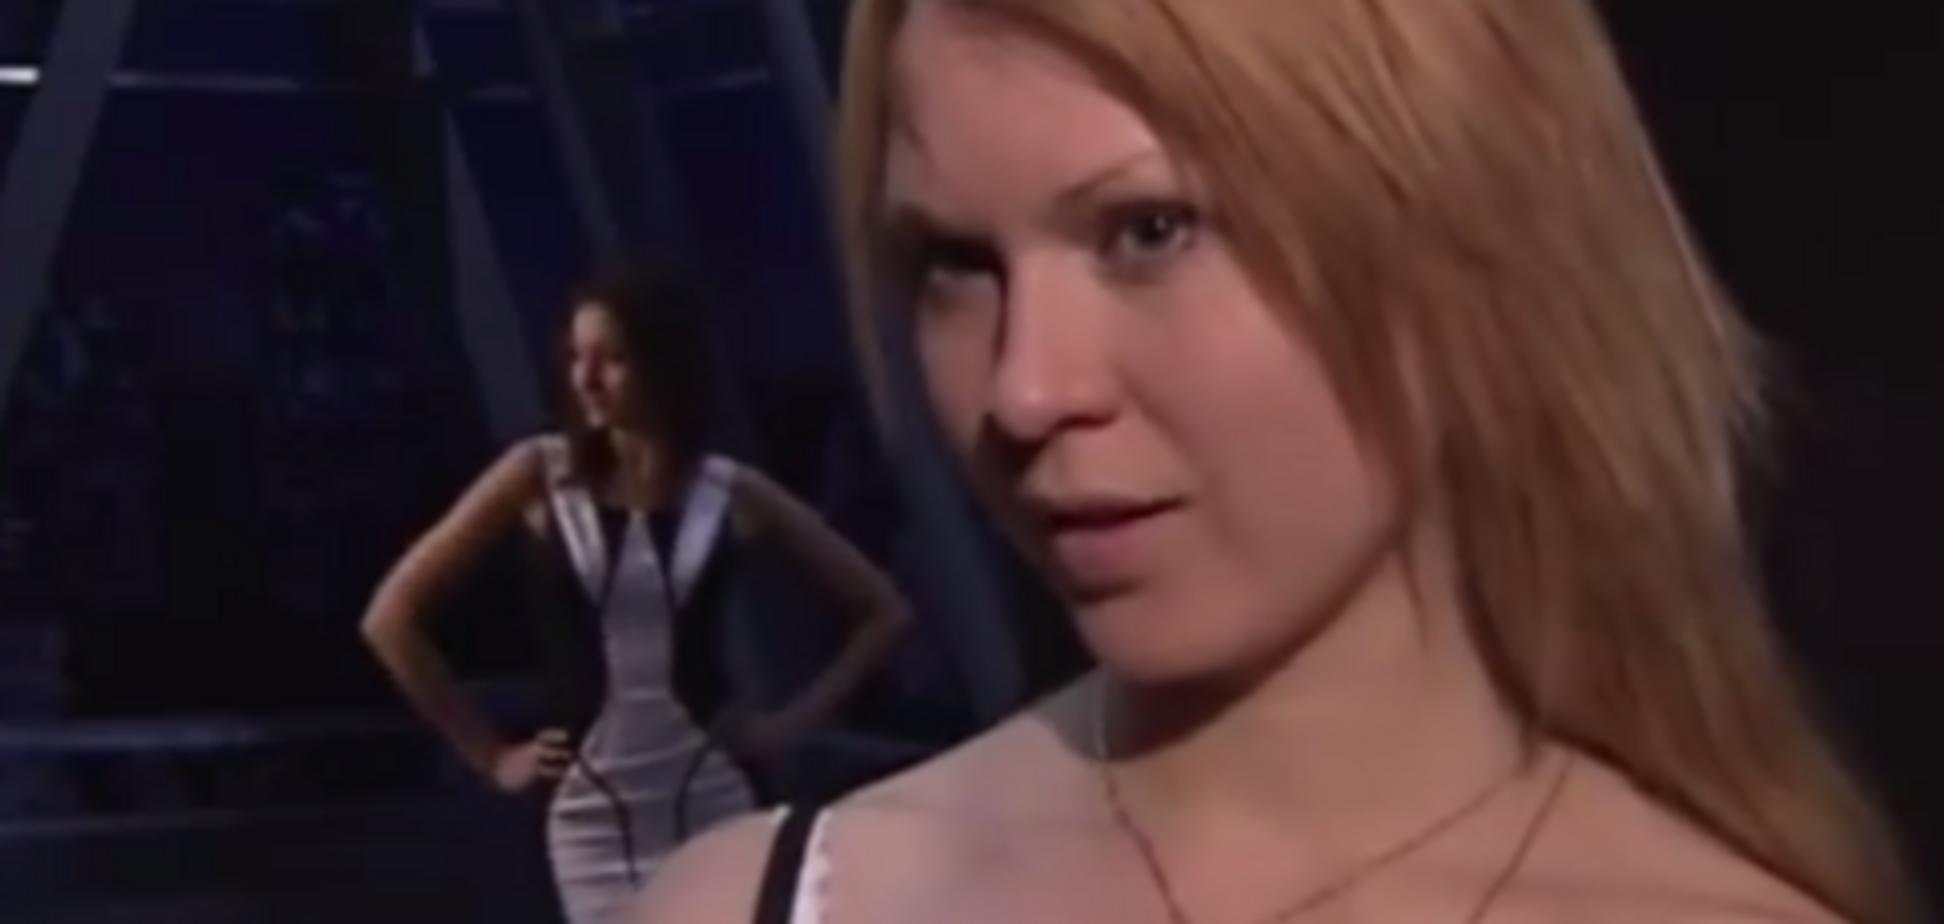 Участница кастинга на конкурс Русские красавицы